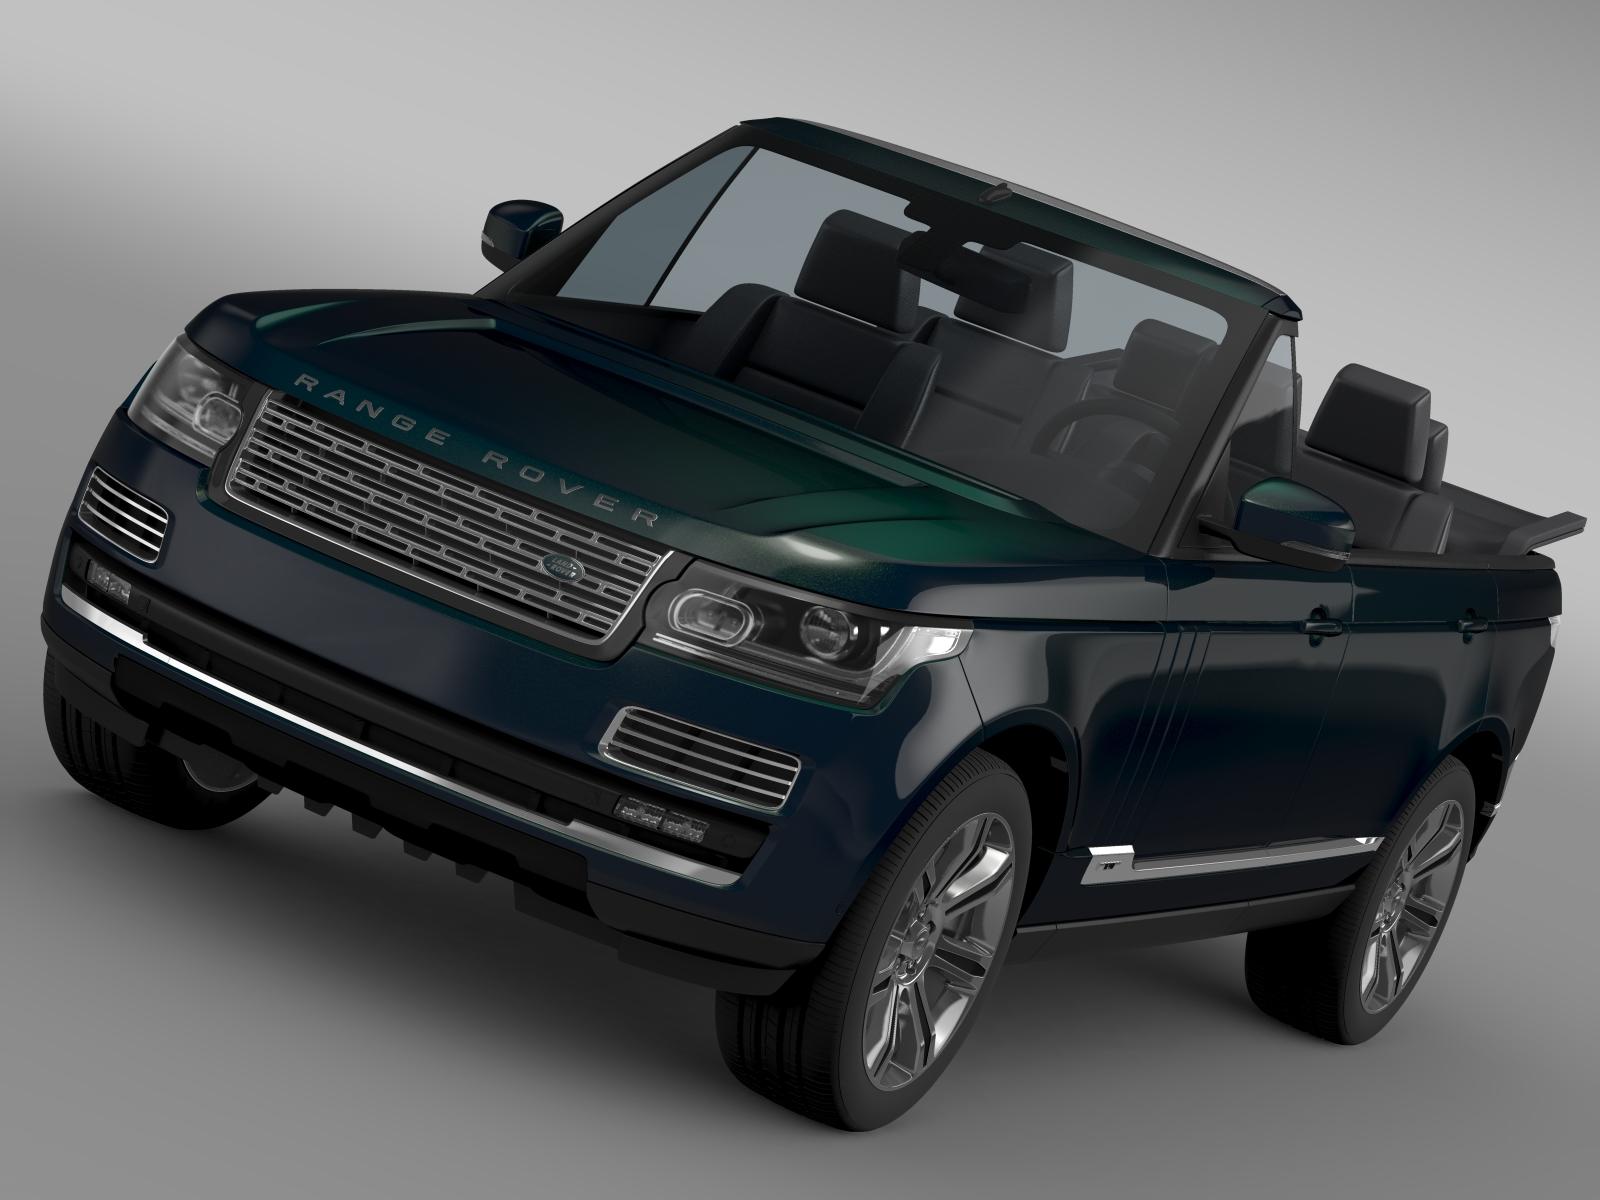 range rover autobiography black lwb cabrio l405 20 3d model 3ds max fbx c4d lwo ma mb hrc xsi obj 212152